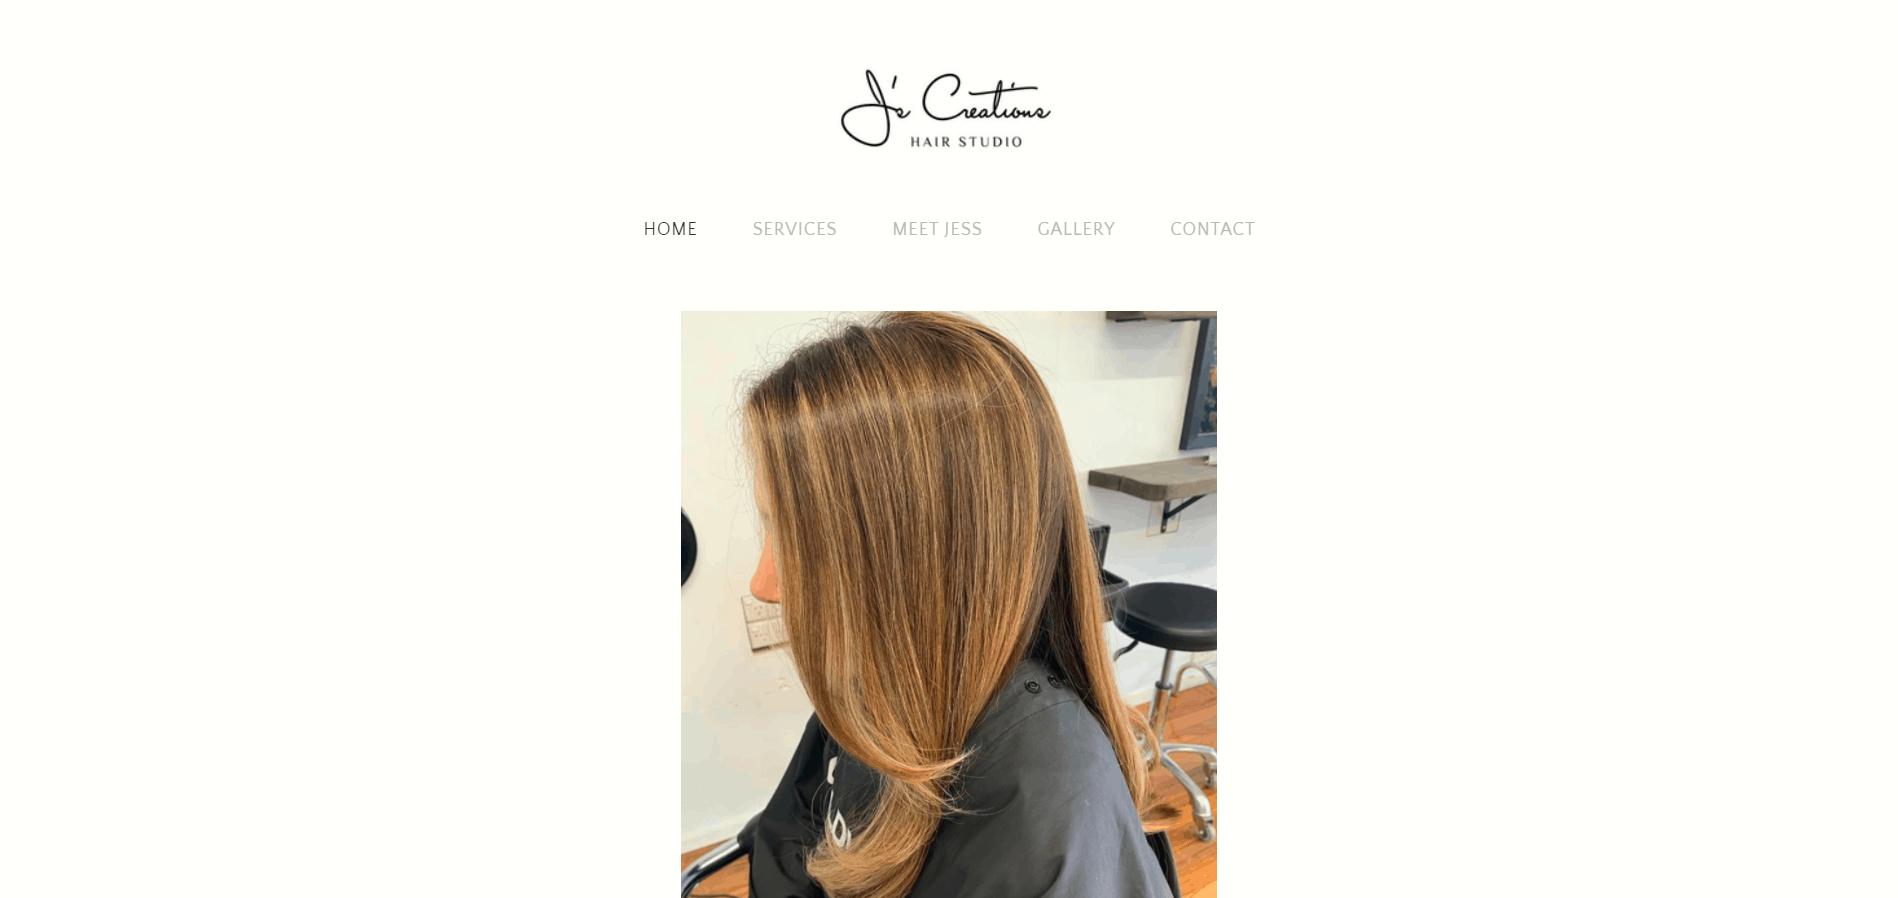 J S Creations Hair Studio